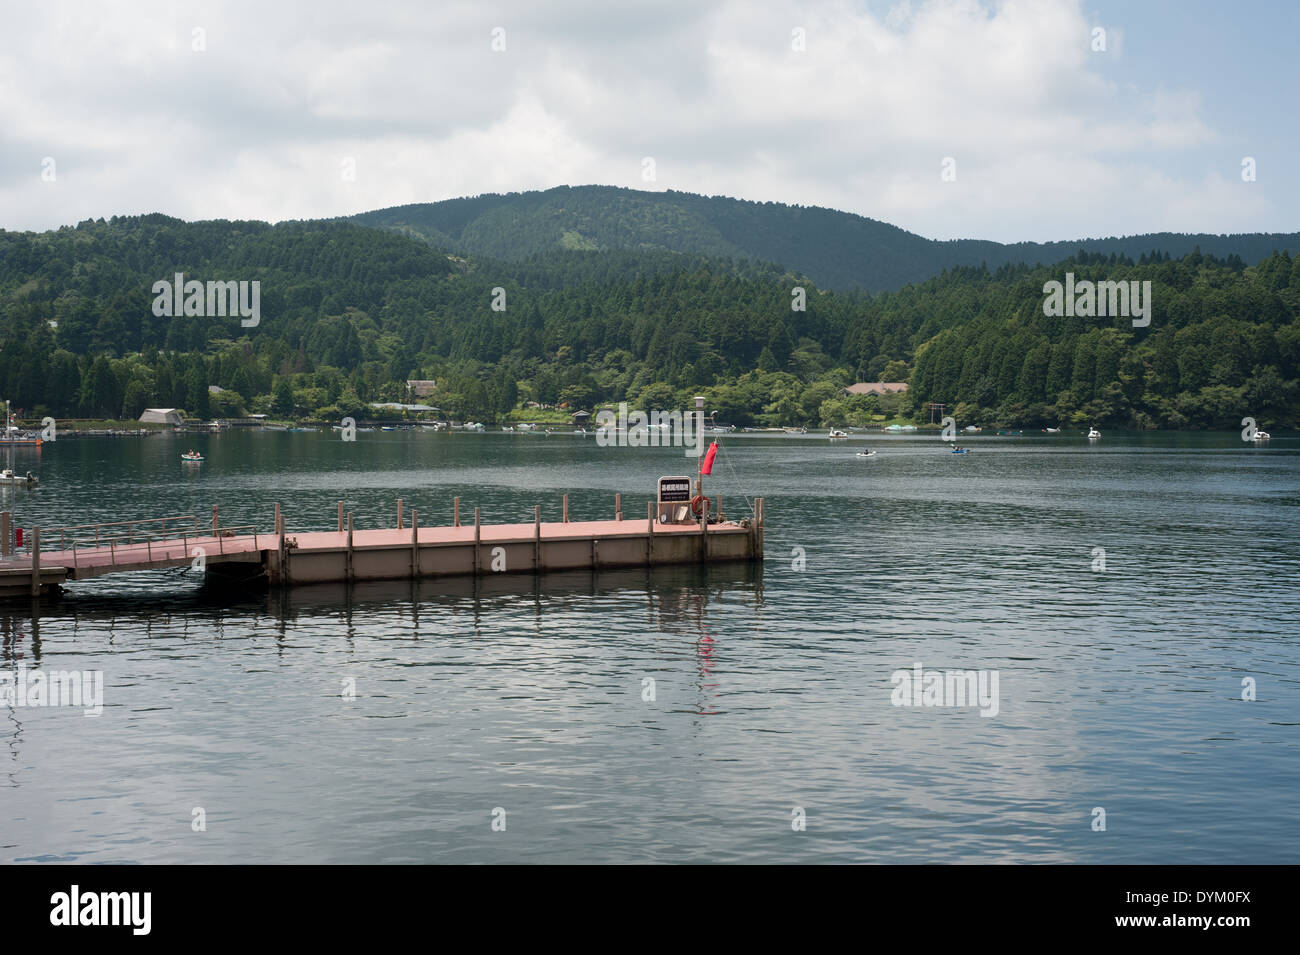 Ashinoko Lake, Hakone, Kanagawa Prefecture, Japan - Stock Image